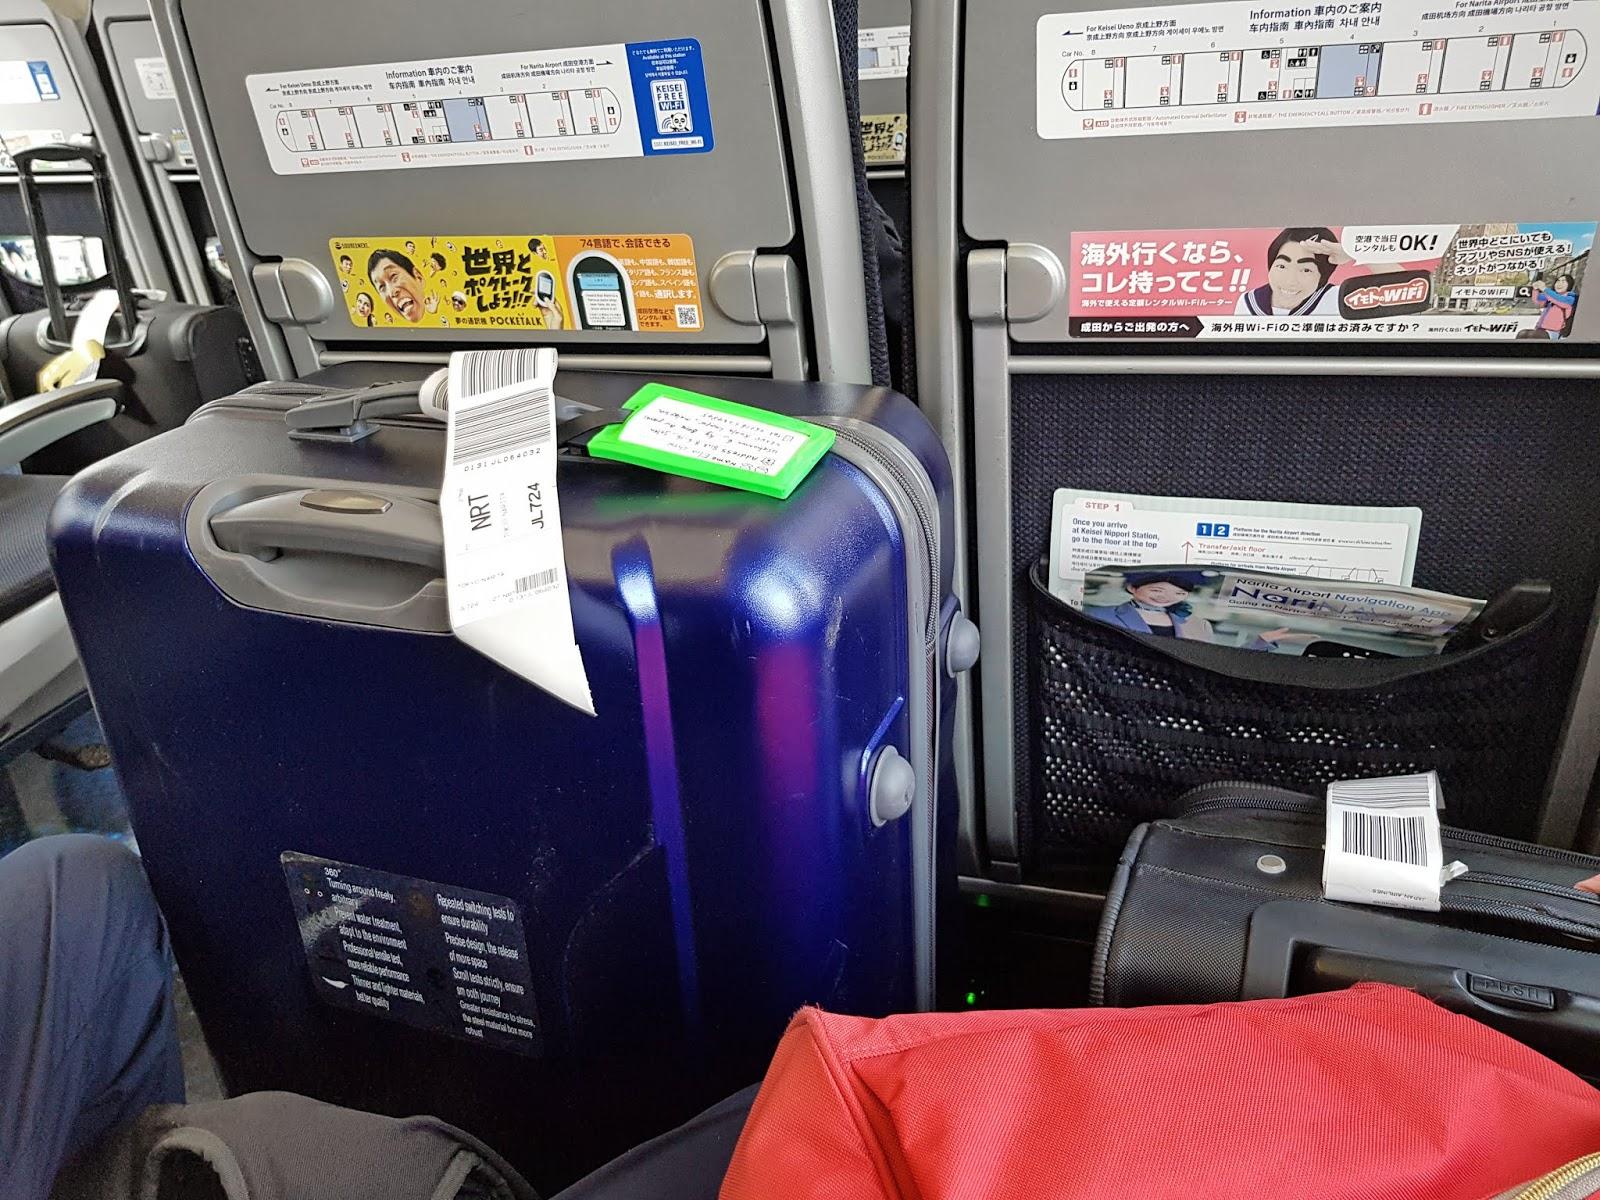 Japan 2019] From Narita International Airport (NRT) to Tokyo